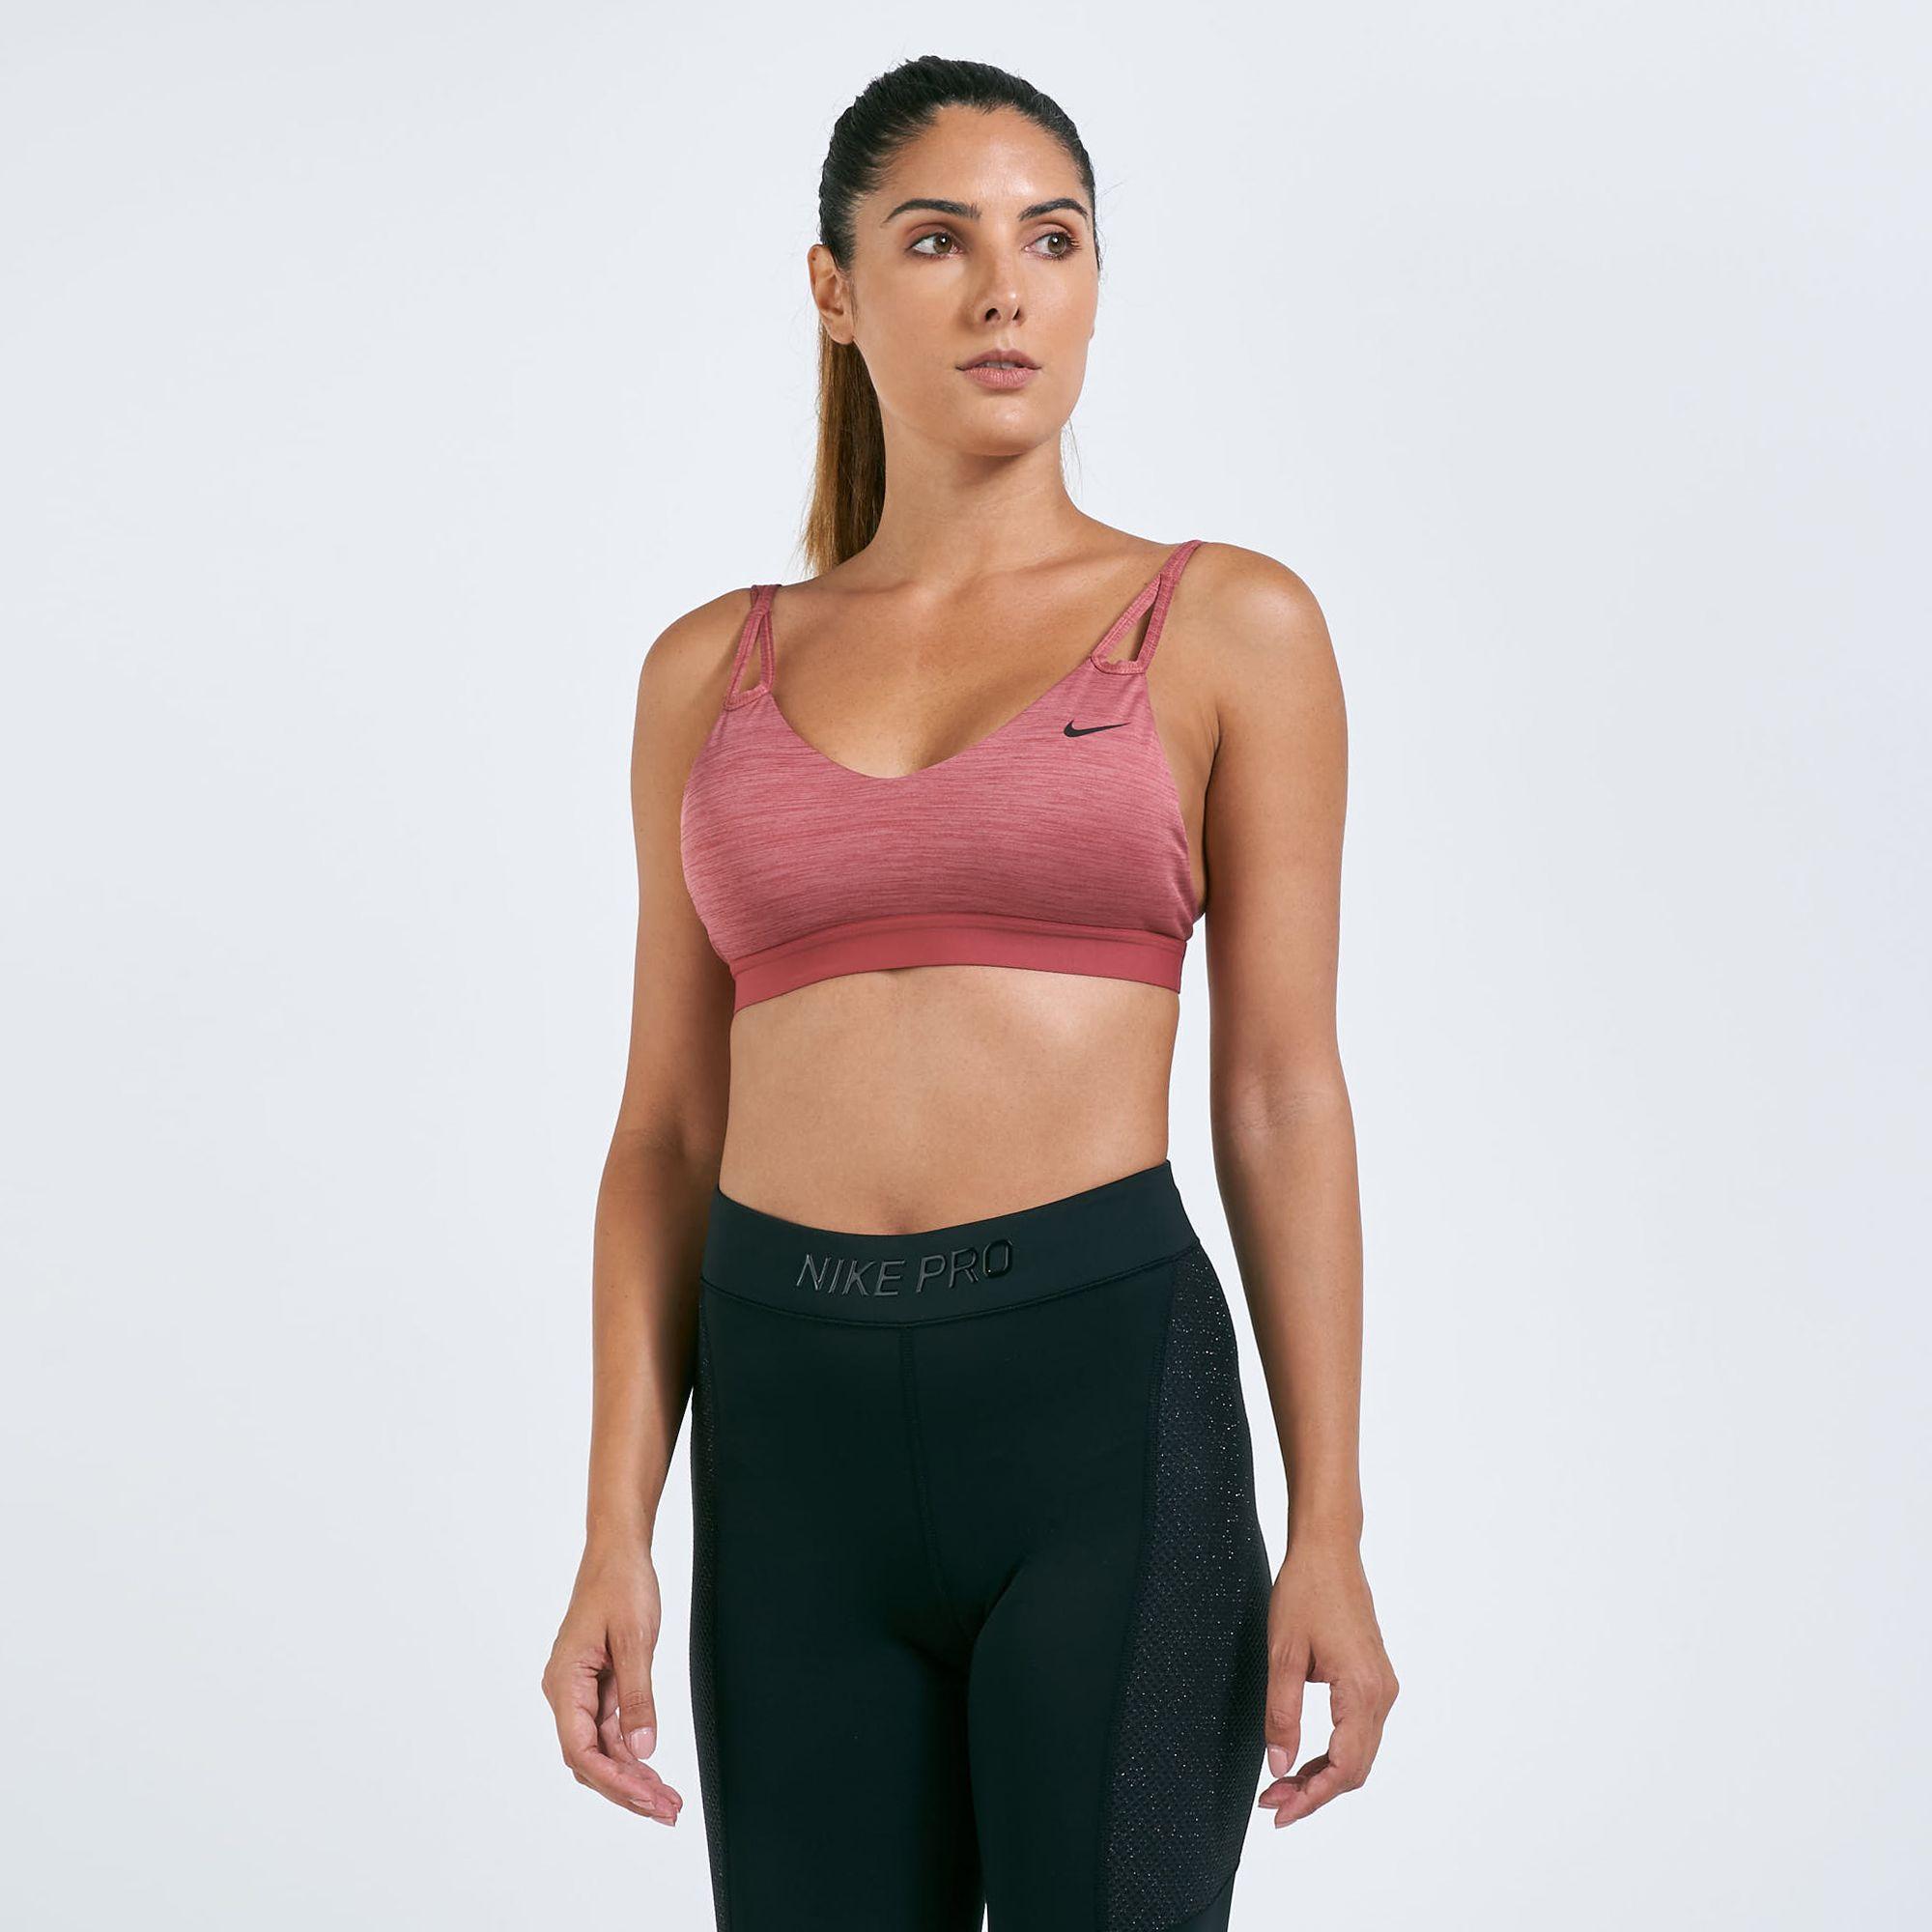 Nike Women S Yoga Sports Bra Sports Bra Clothing Women S Sale Sale Sss